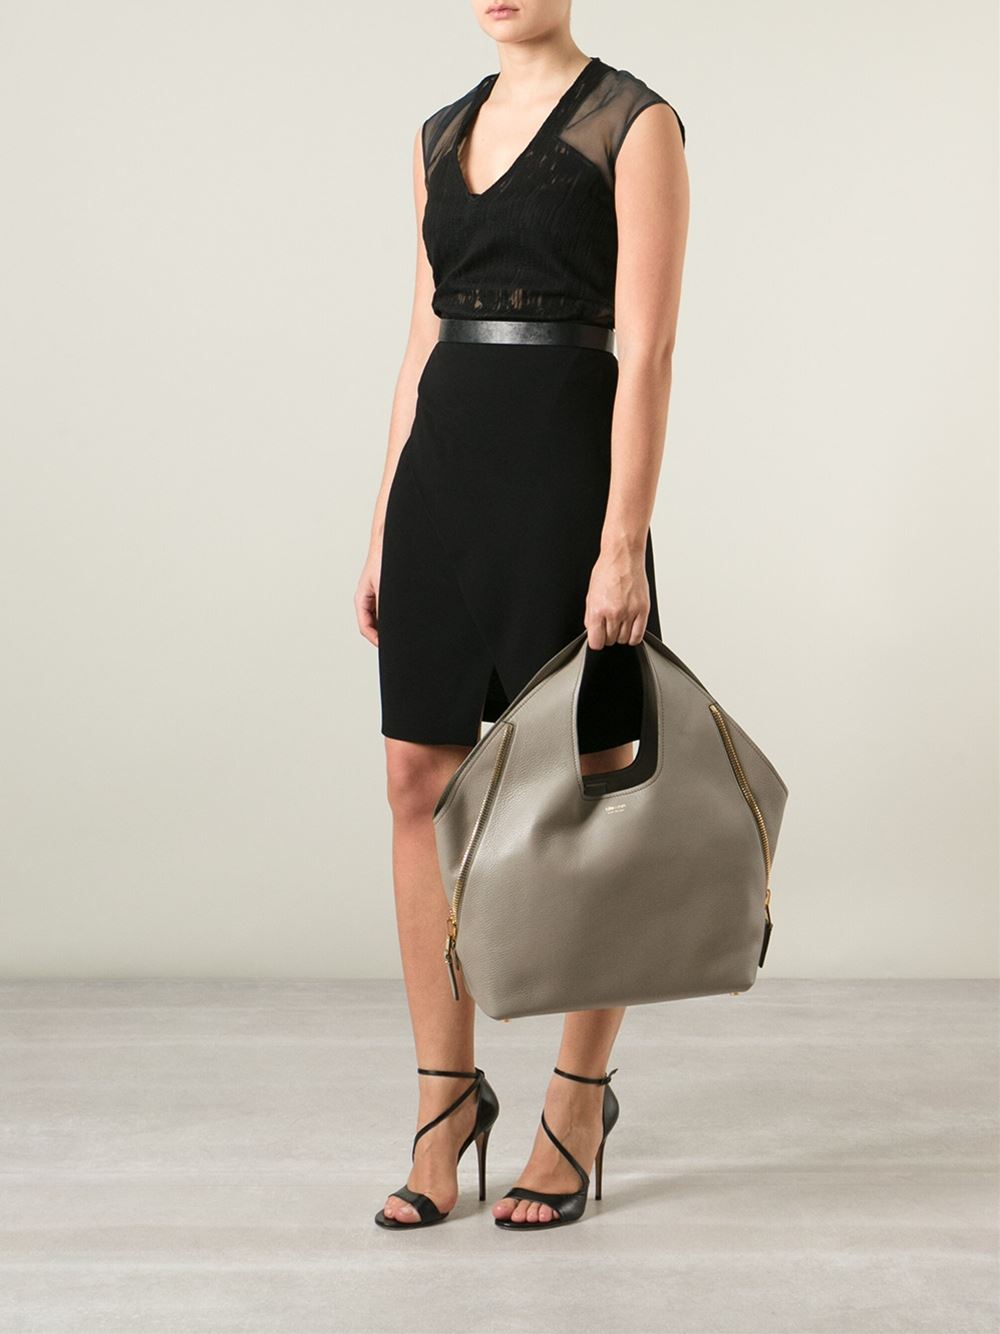 Lyst - Tom Ford Jennifer Side-zip Leather Bag in Gray 3ca5dbf15428d